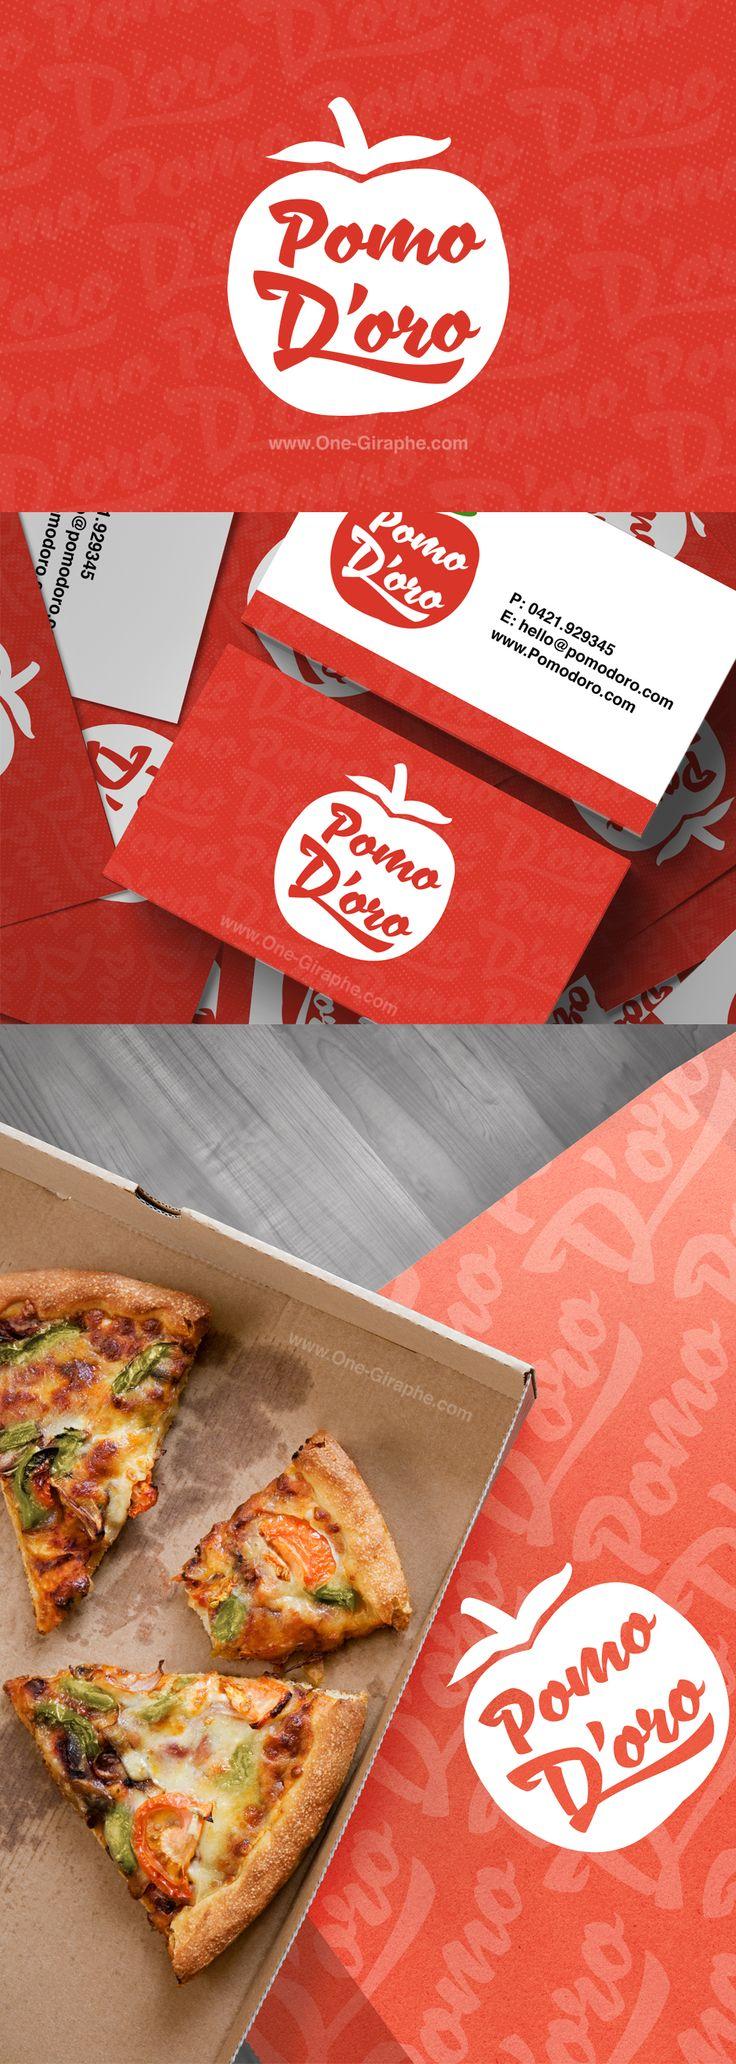 24 best pizza images on Pinterest | Package design, Pizza branding ...